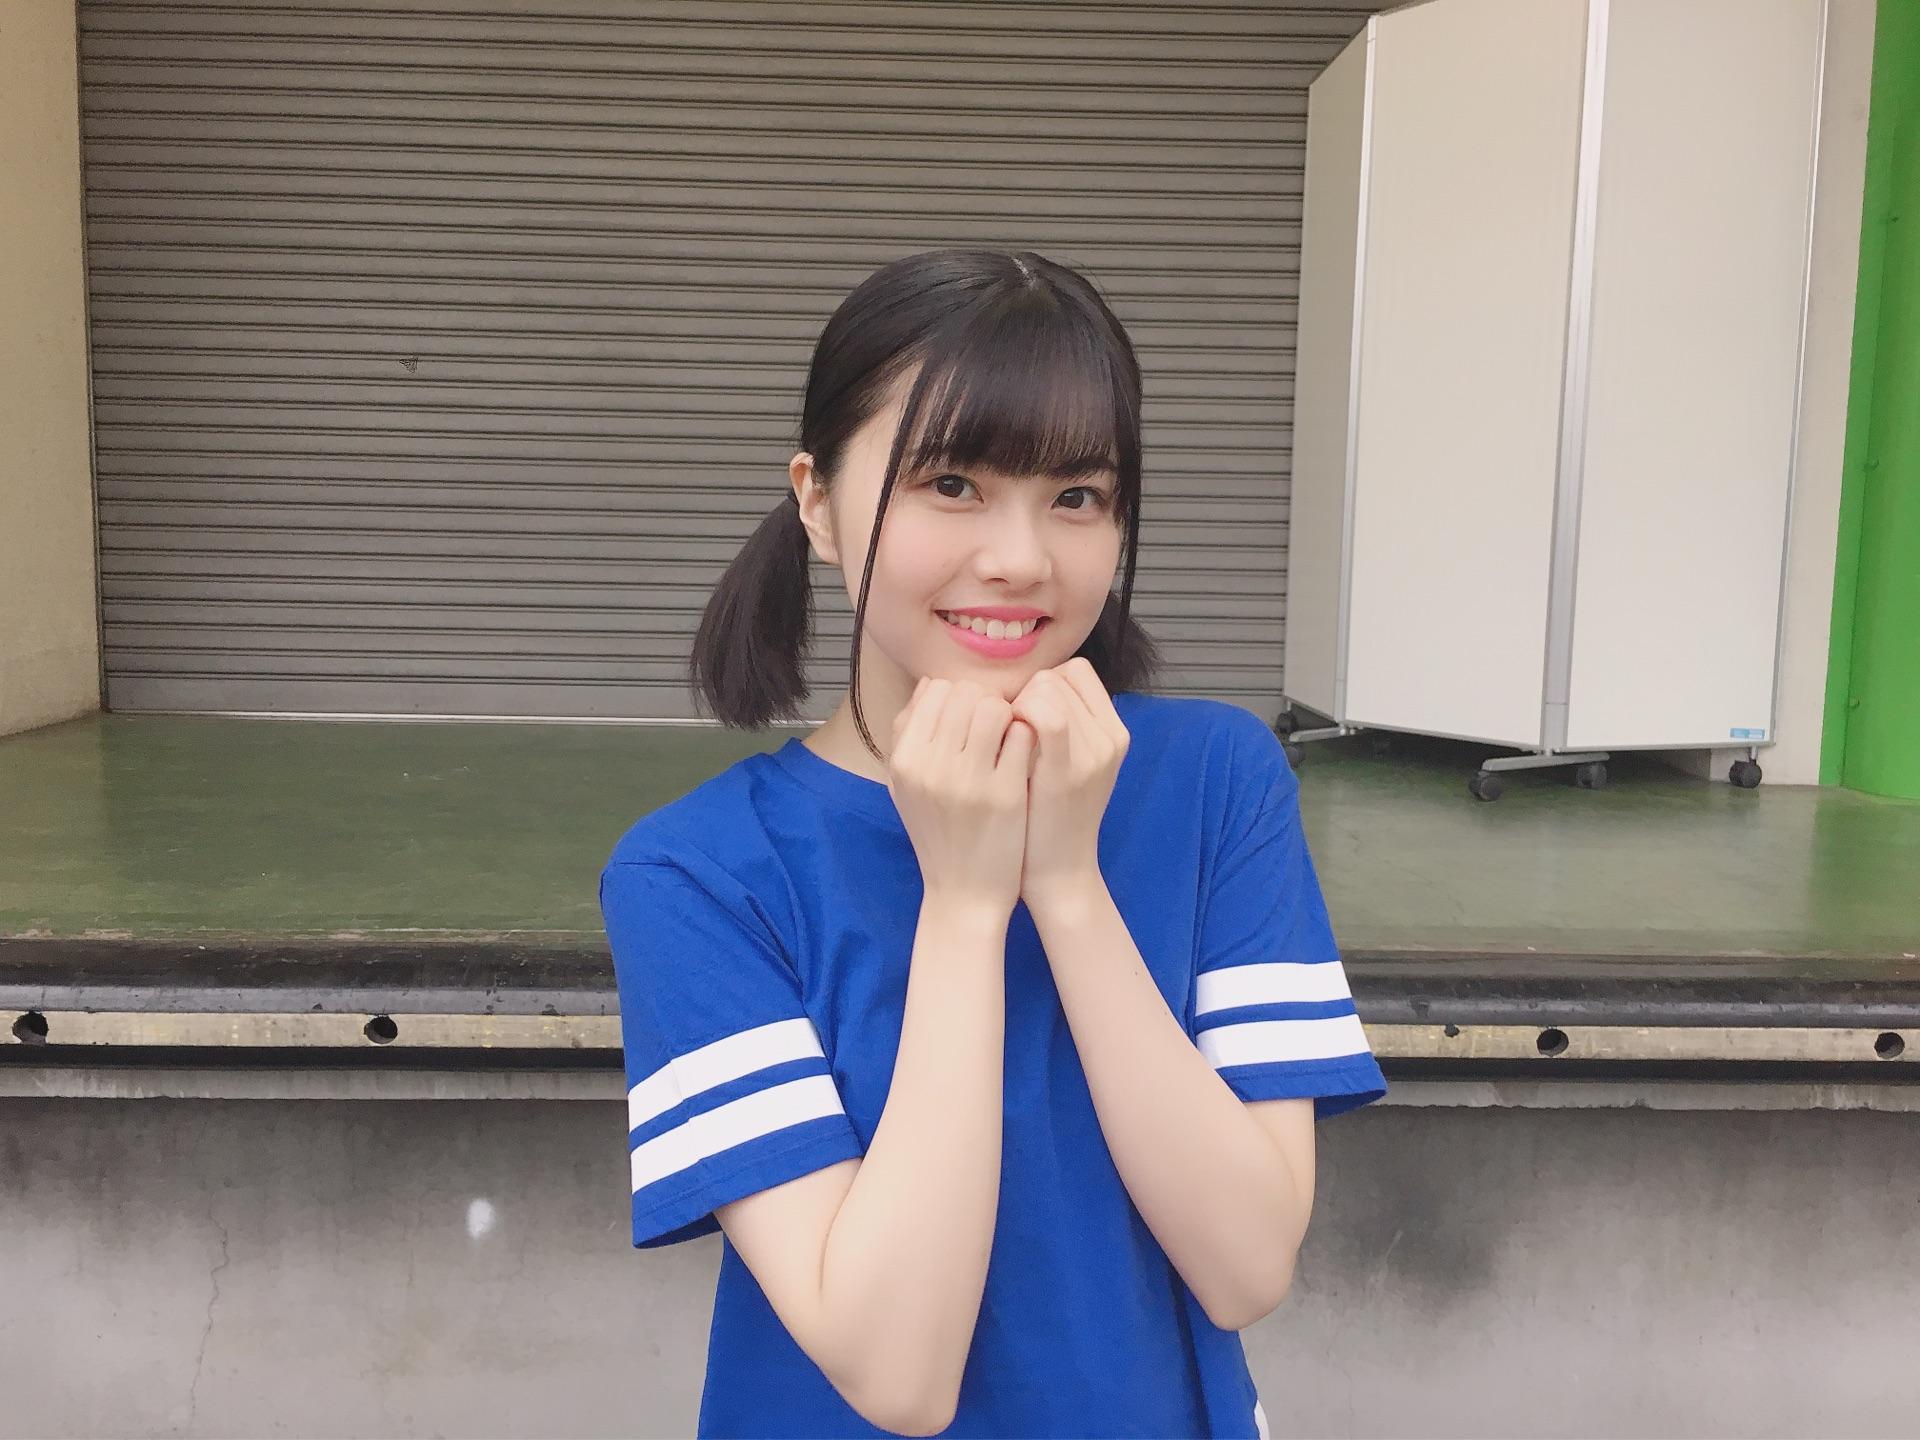 【HKT48】地頭江音々ちゃん応援スレ☆4【4期生】 YouTube動画>7本 ->画像>2709枚